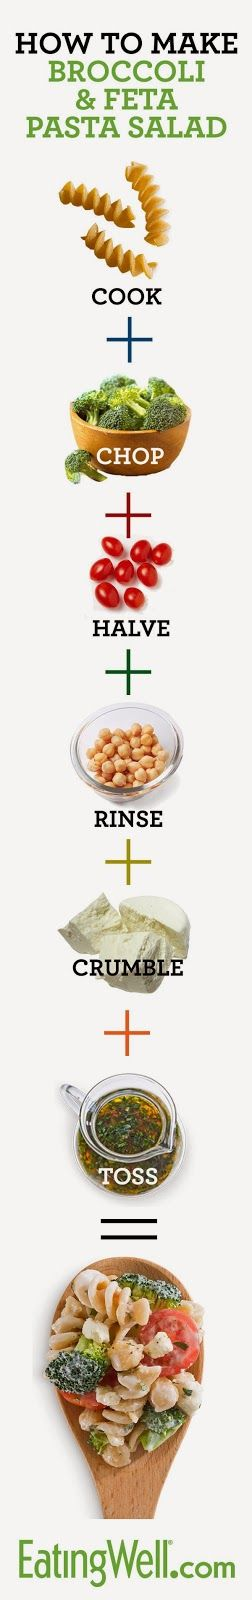 Interesting Presentation of The Recipe, also Delicious Healthy Pasta Salad Recipe